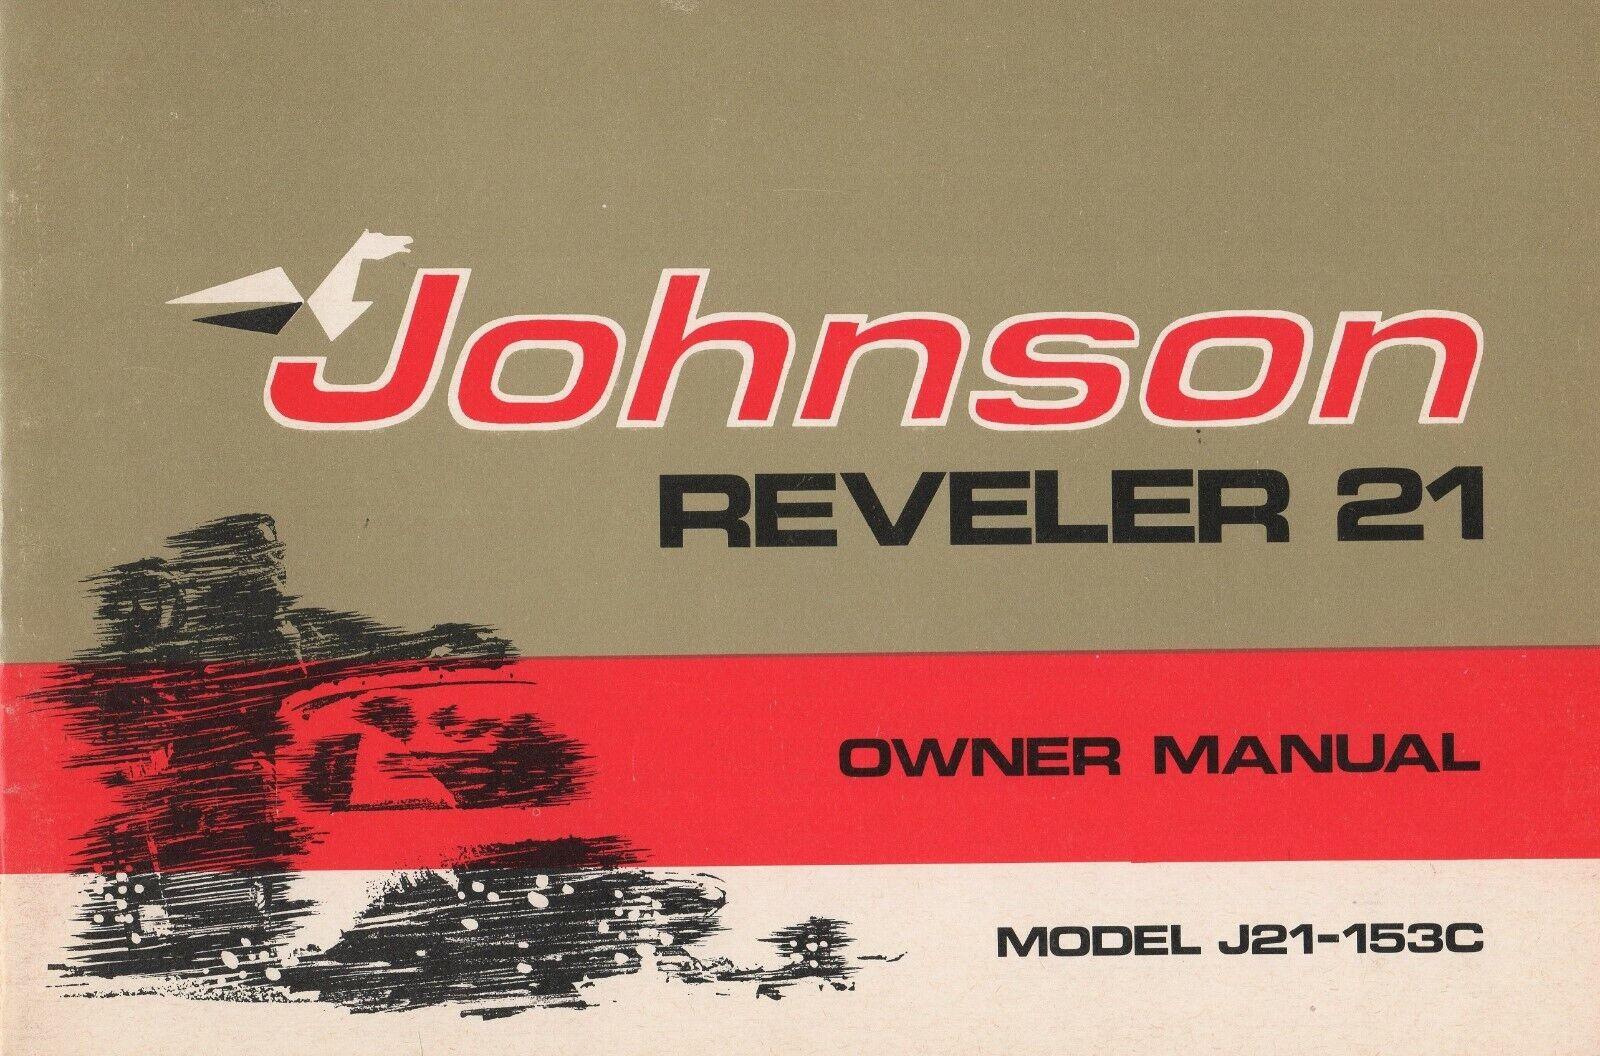 1972 JOHNSON  SNOWMOBILE REVELER 21 OWNERS MANUAL P N 262377 (222)  high quality genuine